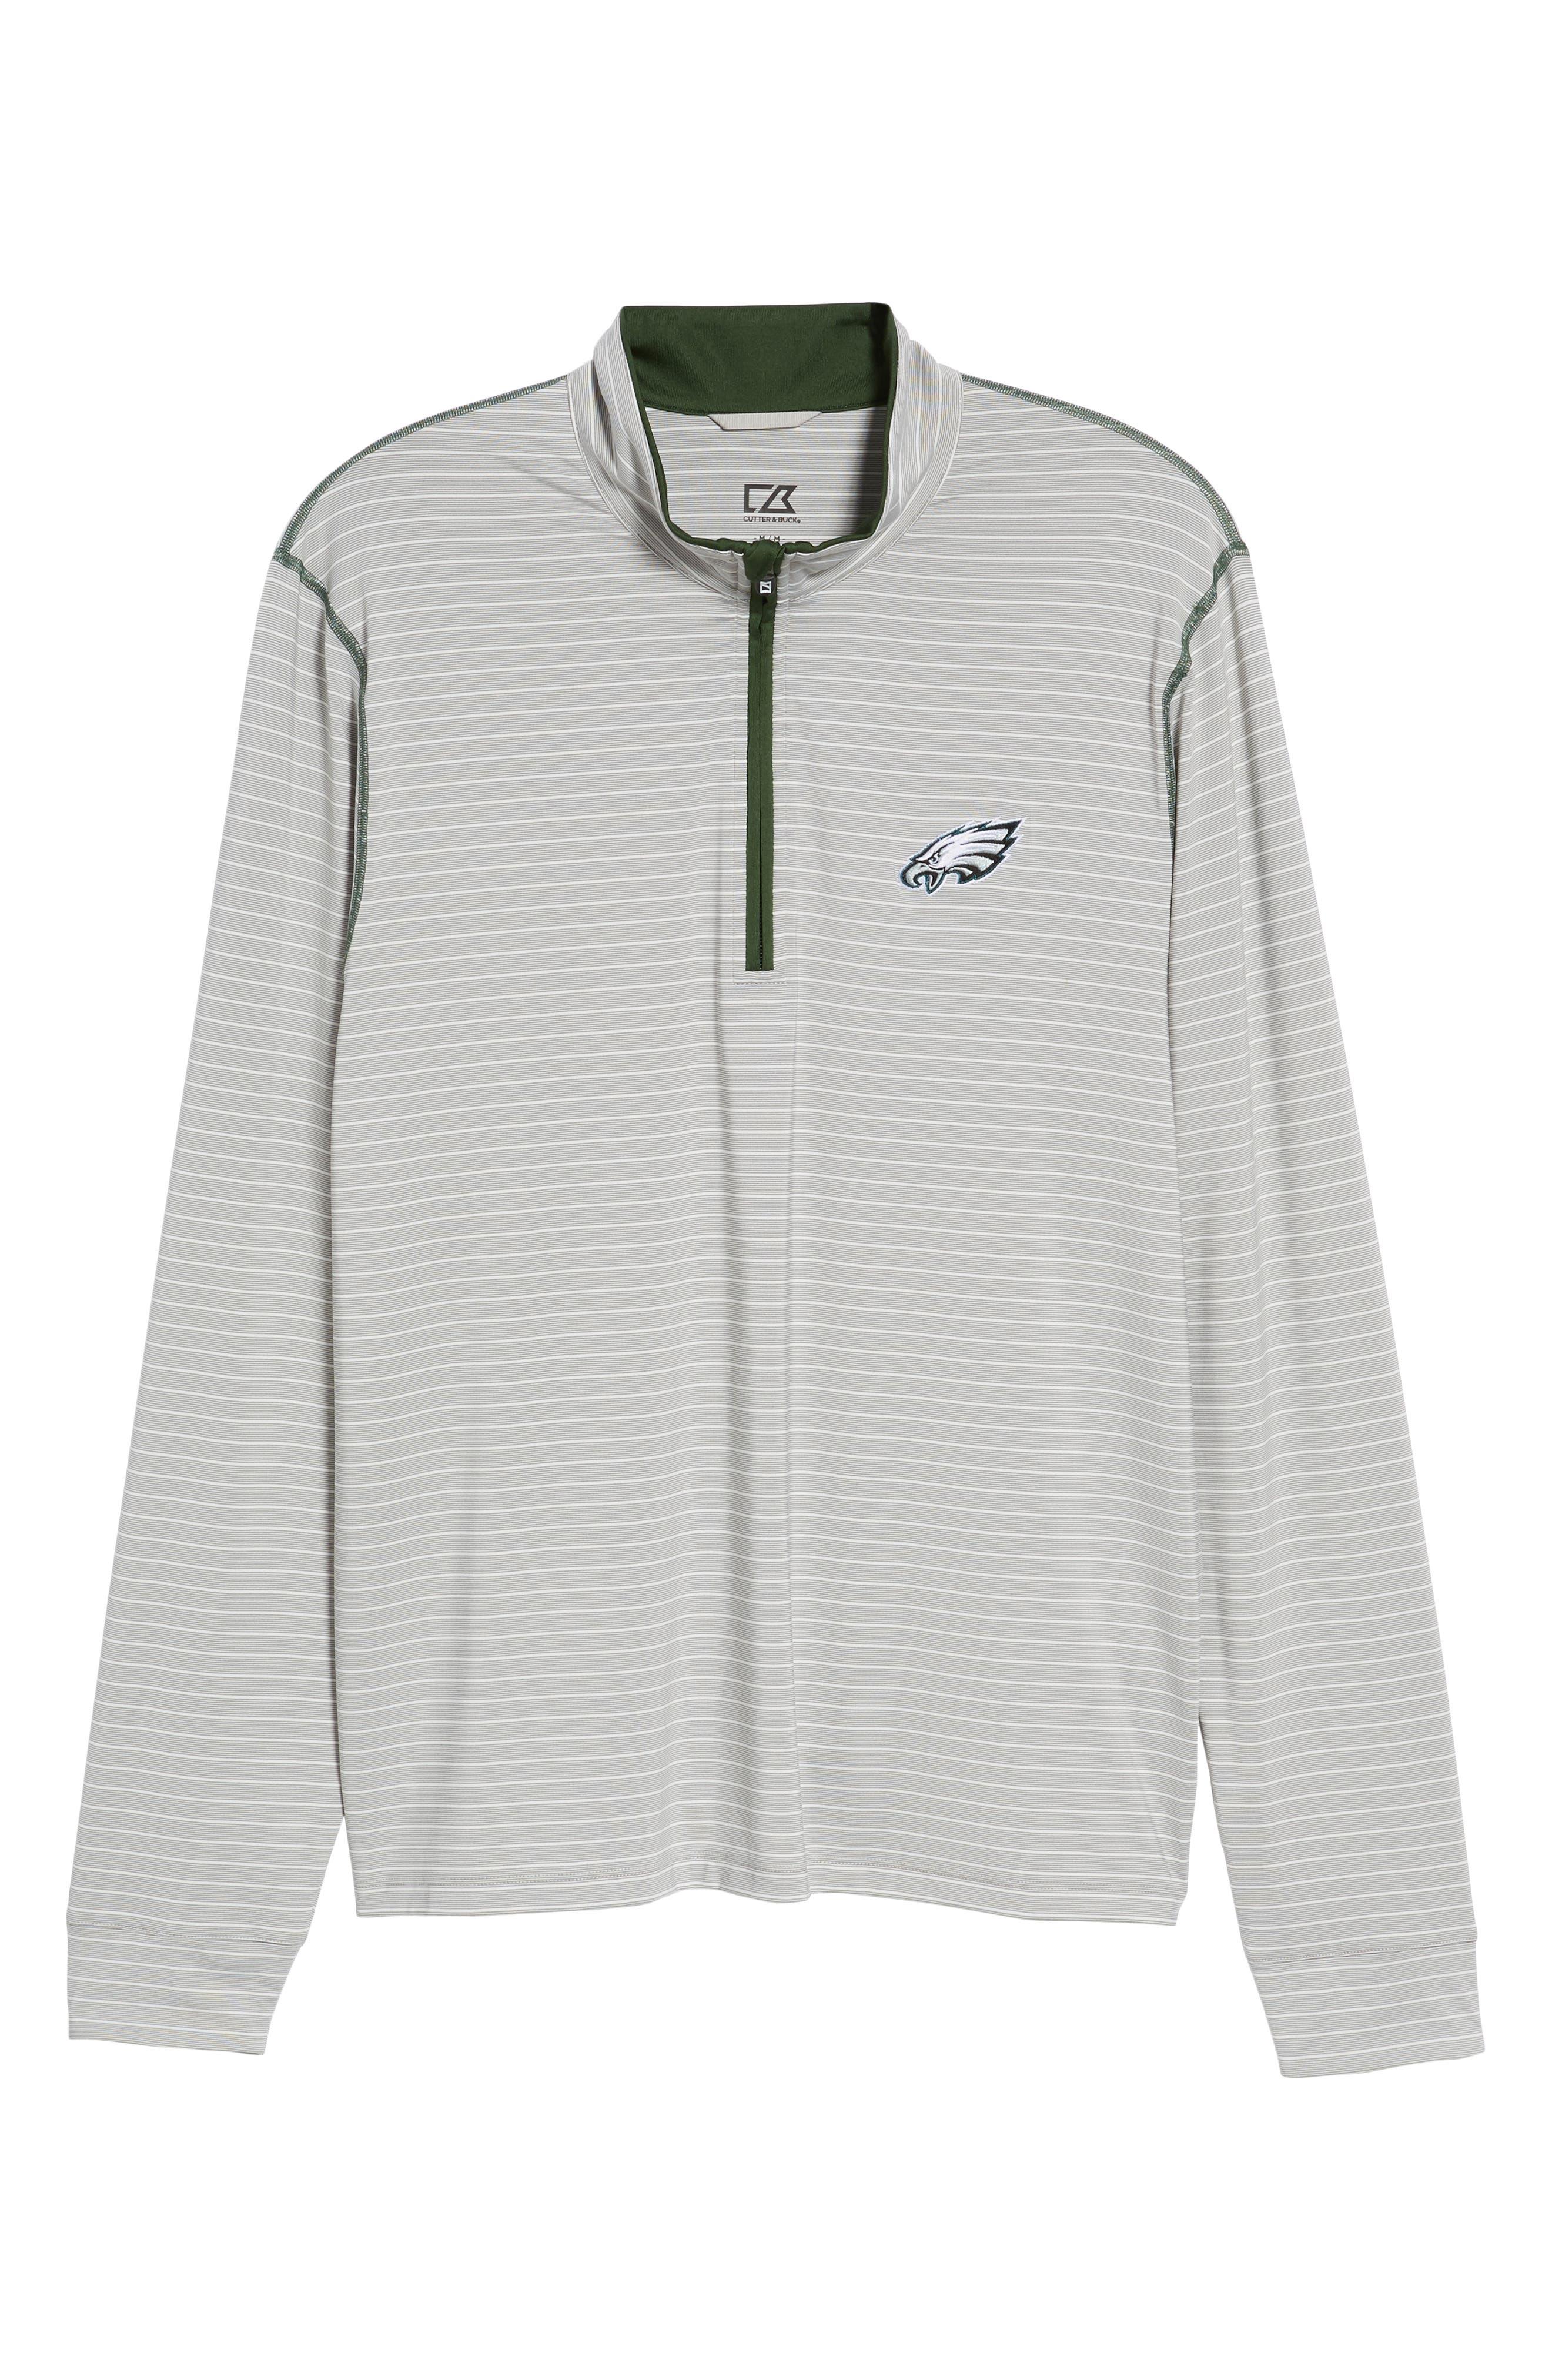 Meridian - Philadelphia Eagles Regular Fit Half Zip Pullover,                             Alternate thumbnail 6, color,                             HUNTER GREEN